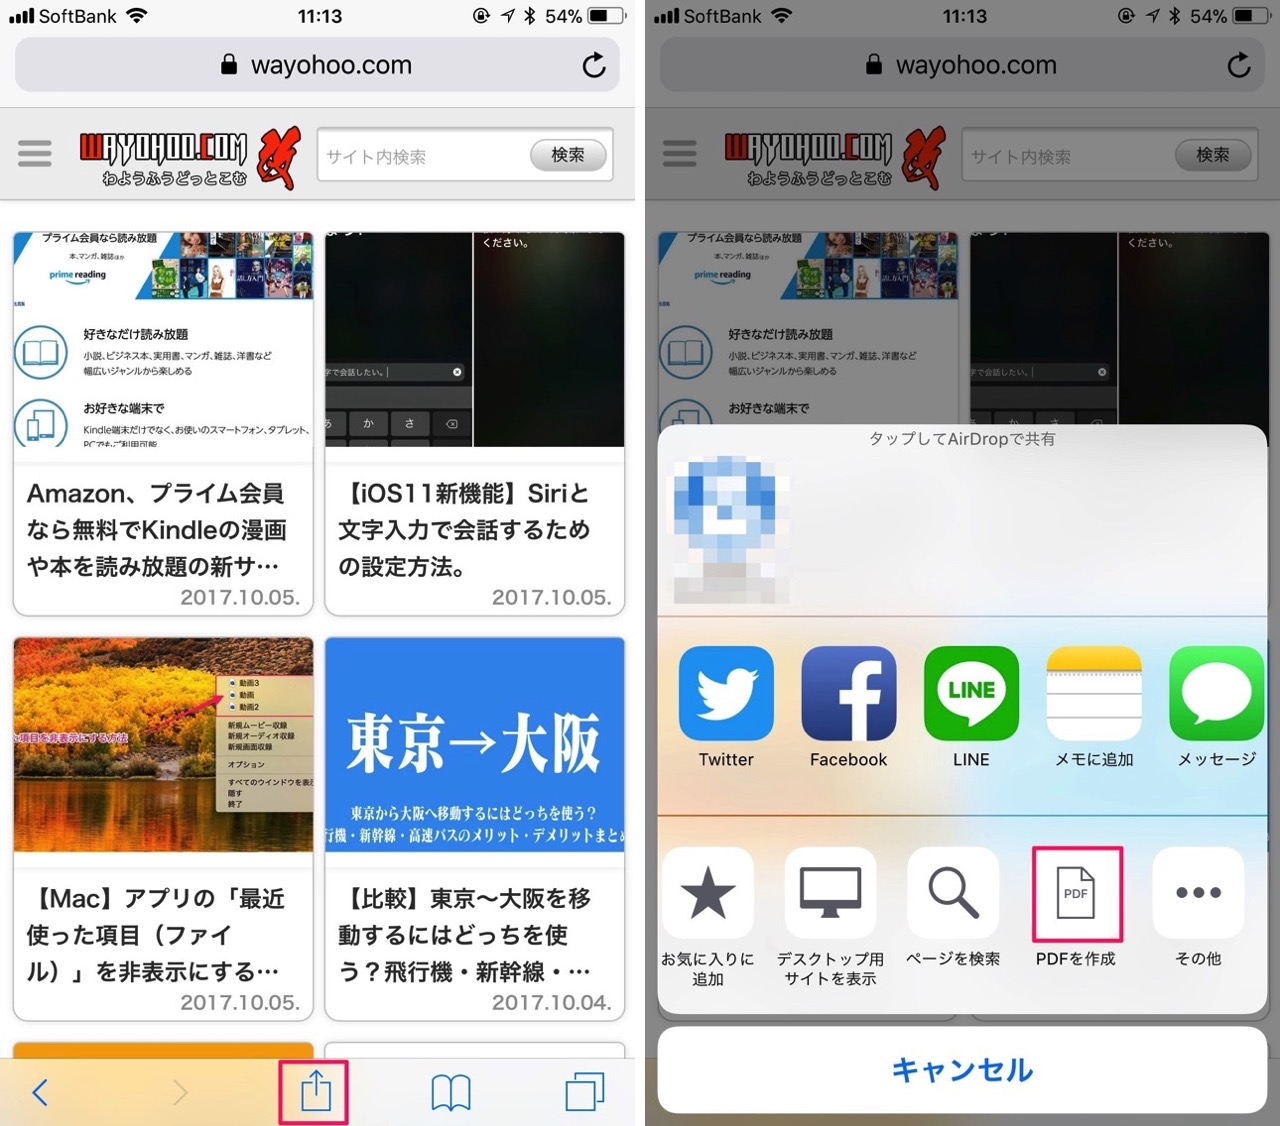 iOS11のSafariでPDFを作成